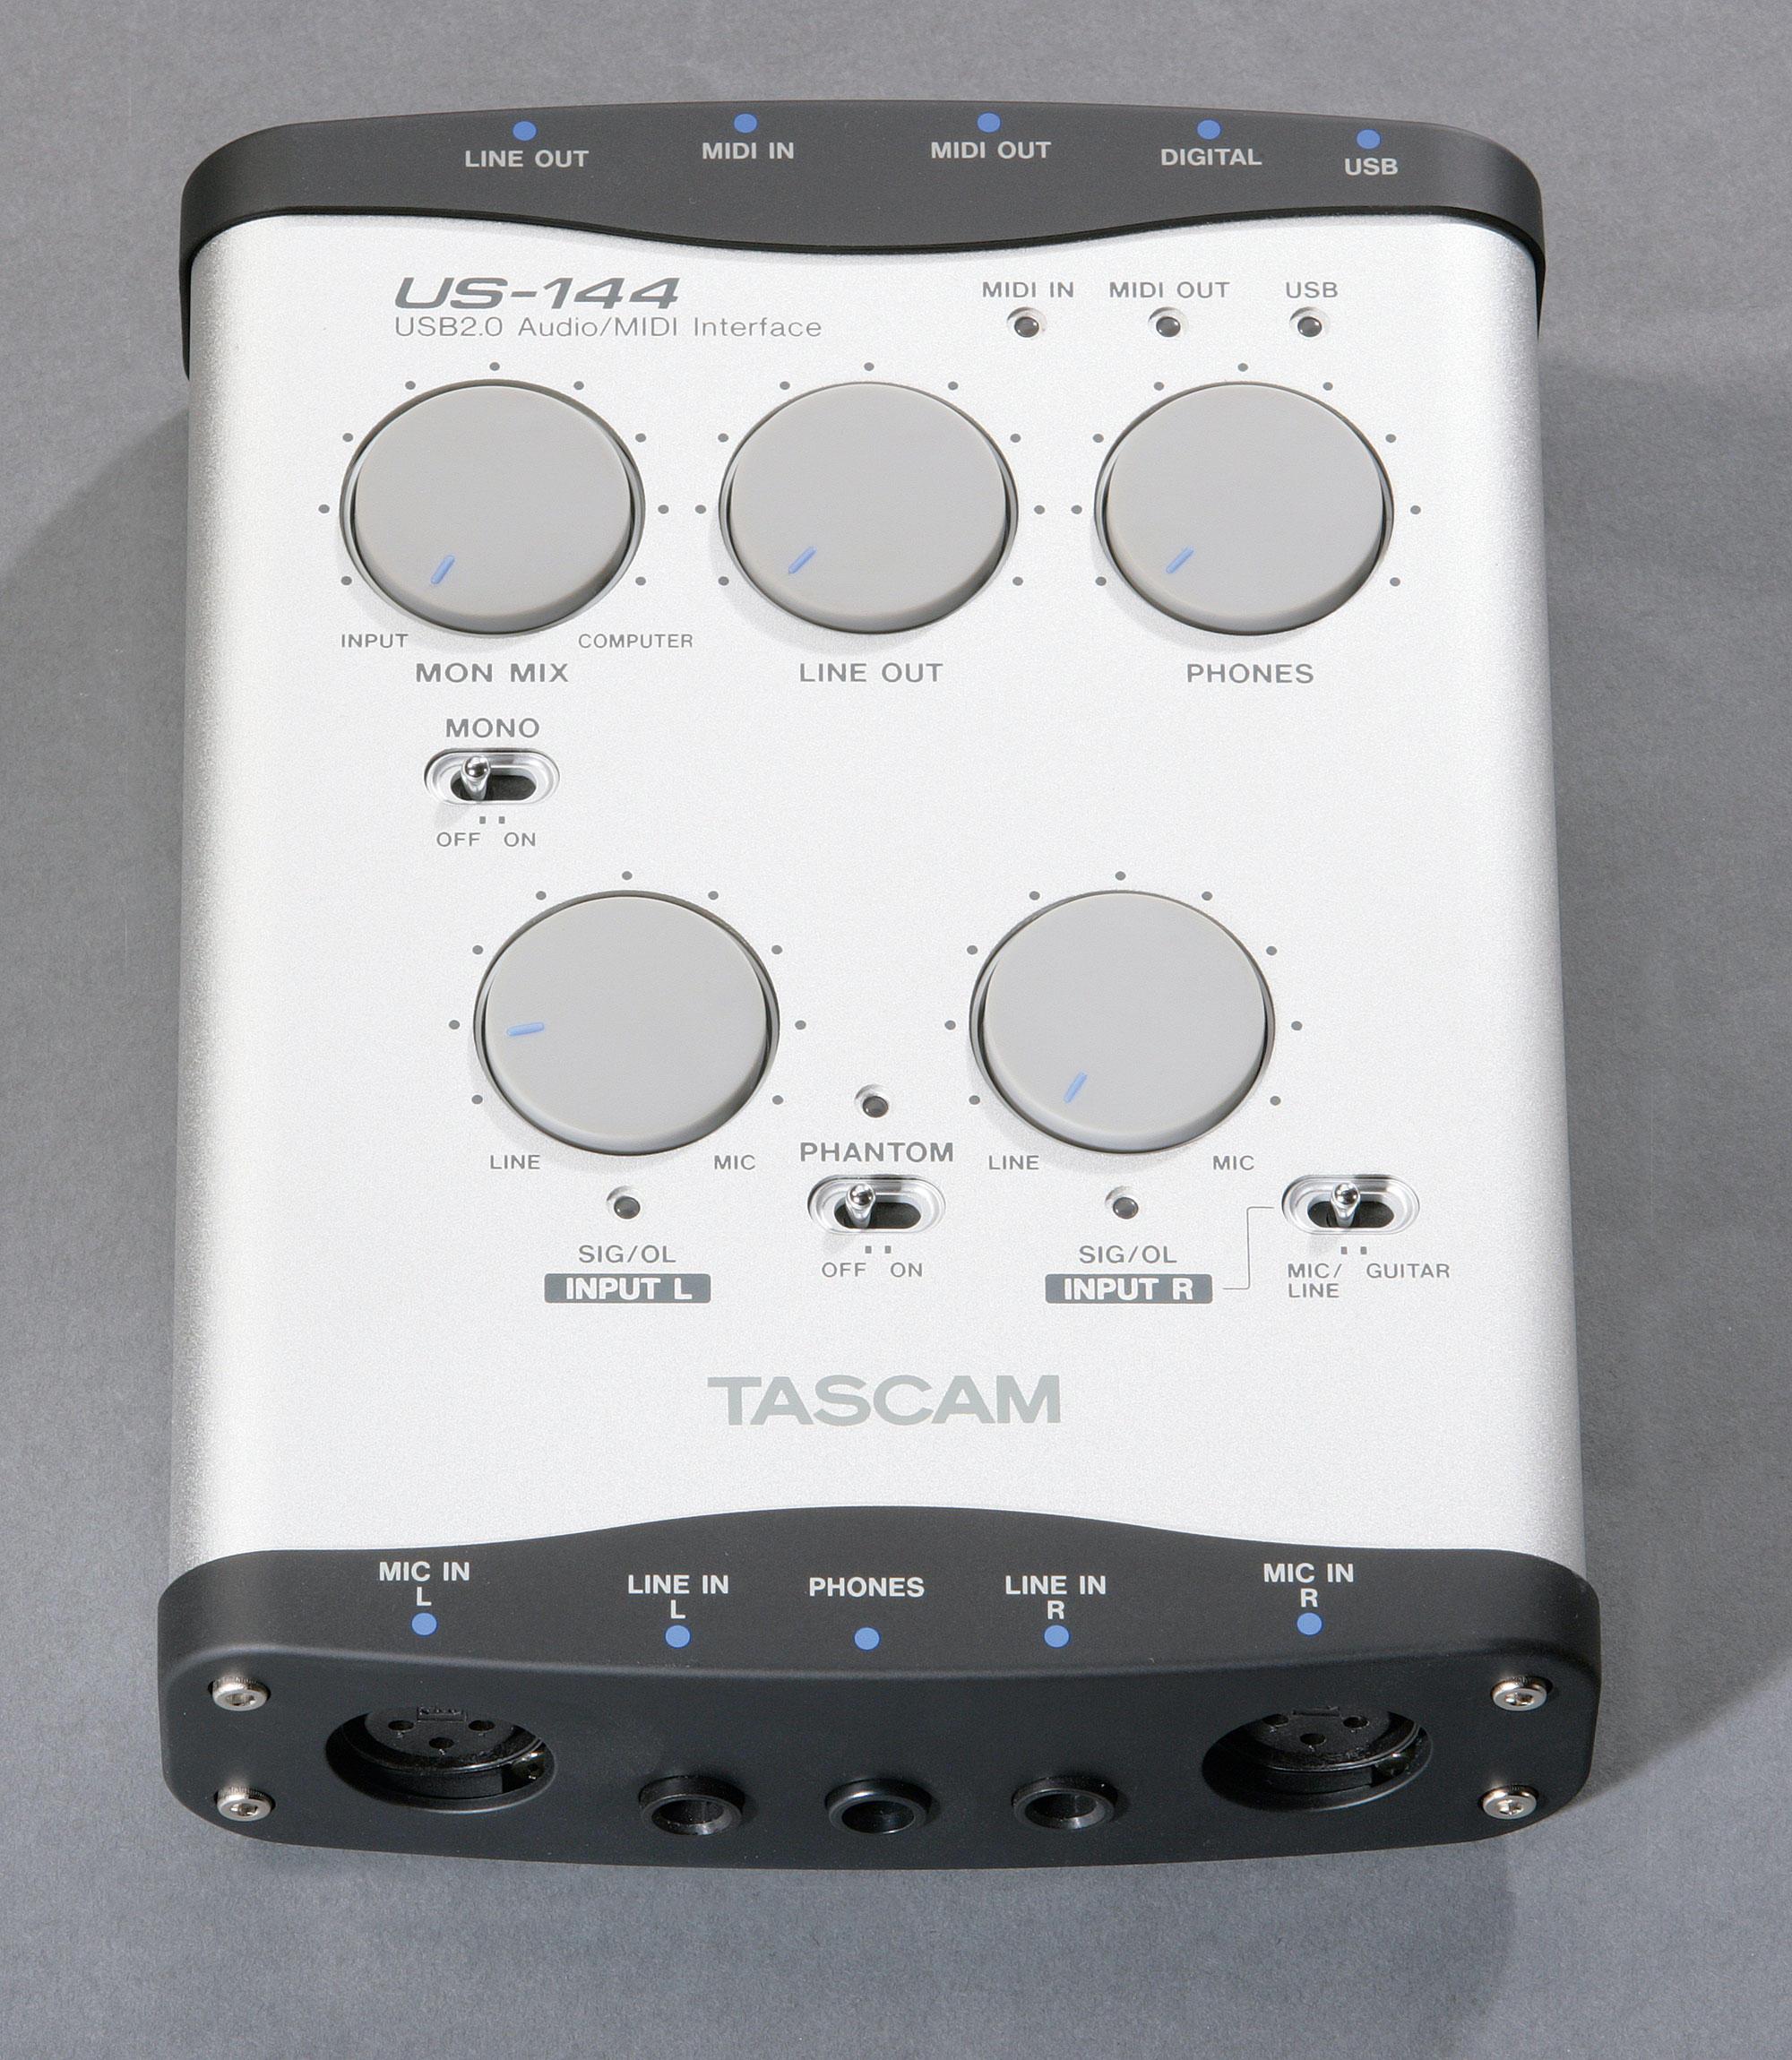 TASCAM New USB 2.0 Audio/MIDI Interfaces